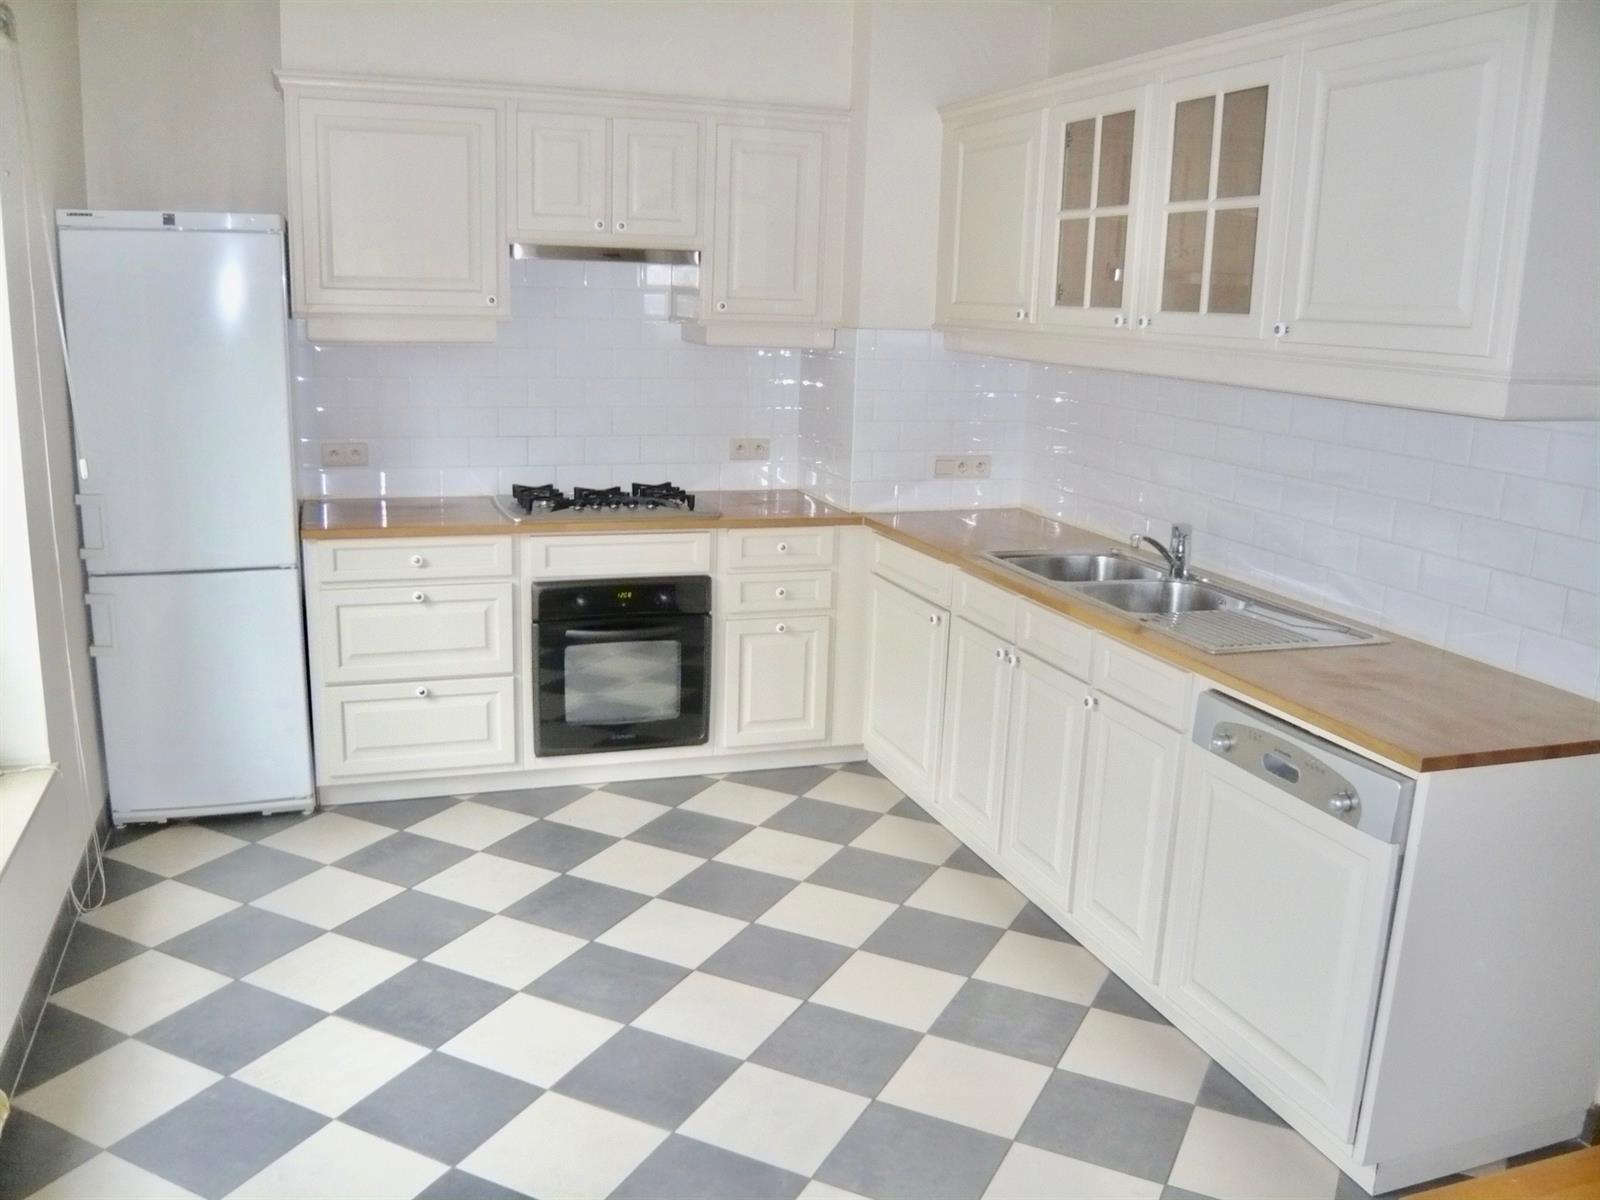 Appartement exceptionnel - Woluwe-Saint-Pierre - #4433517-24